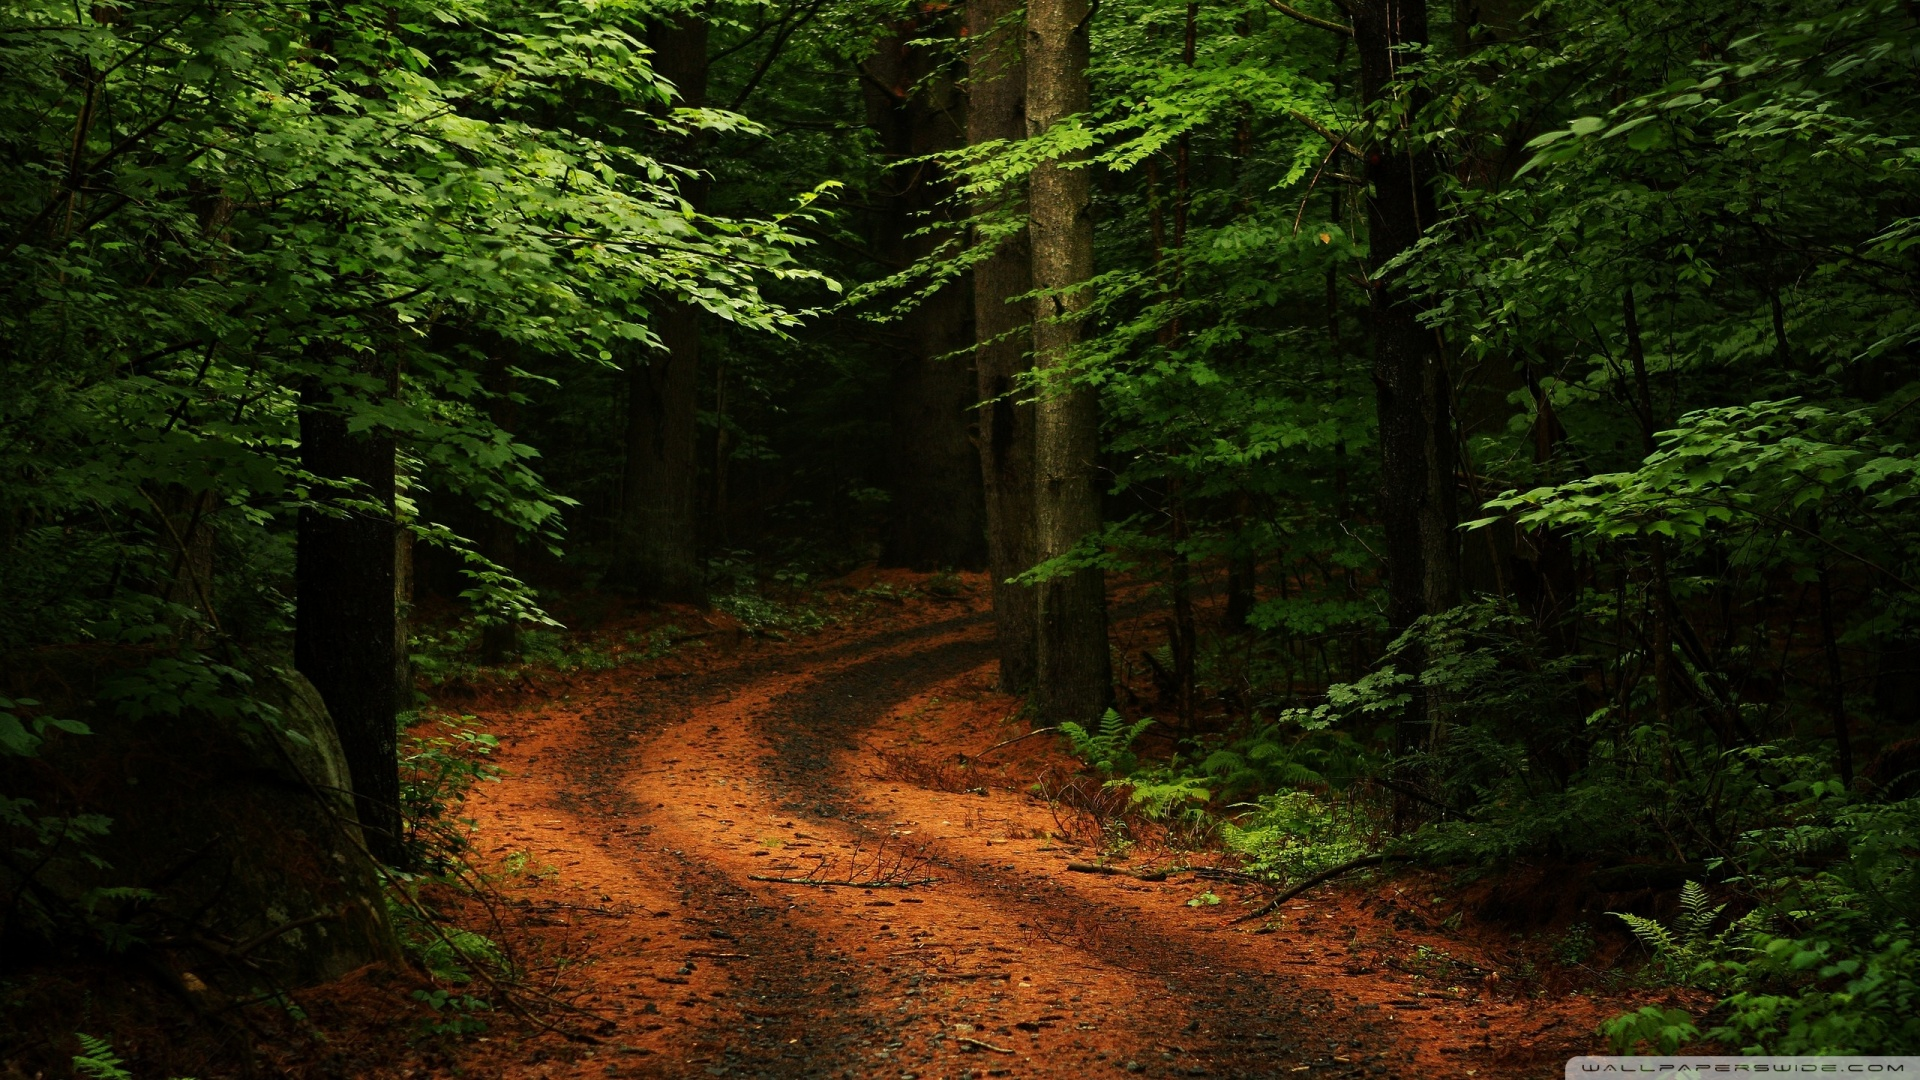 beautiful_forest_path_2-wallpaper-1920x1080